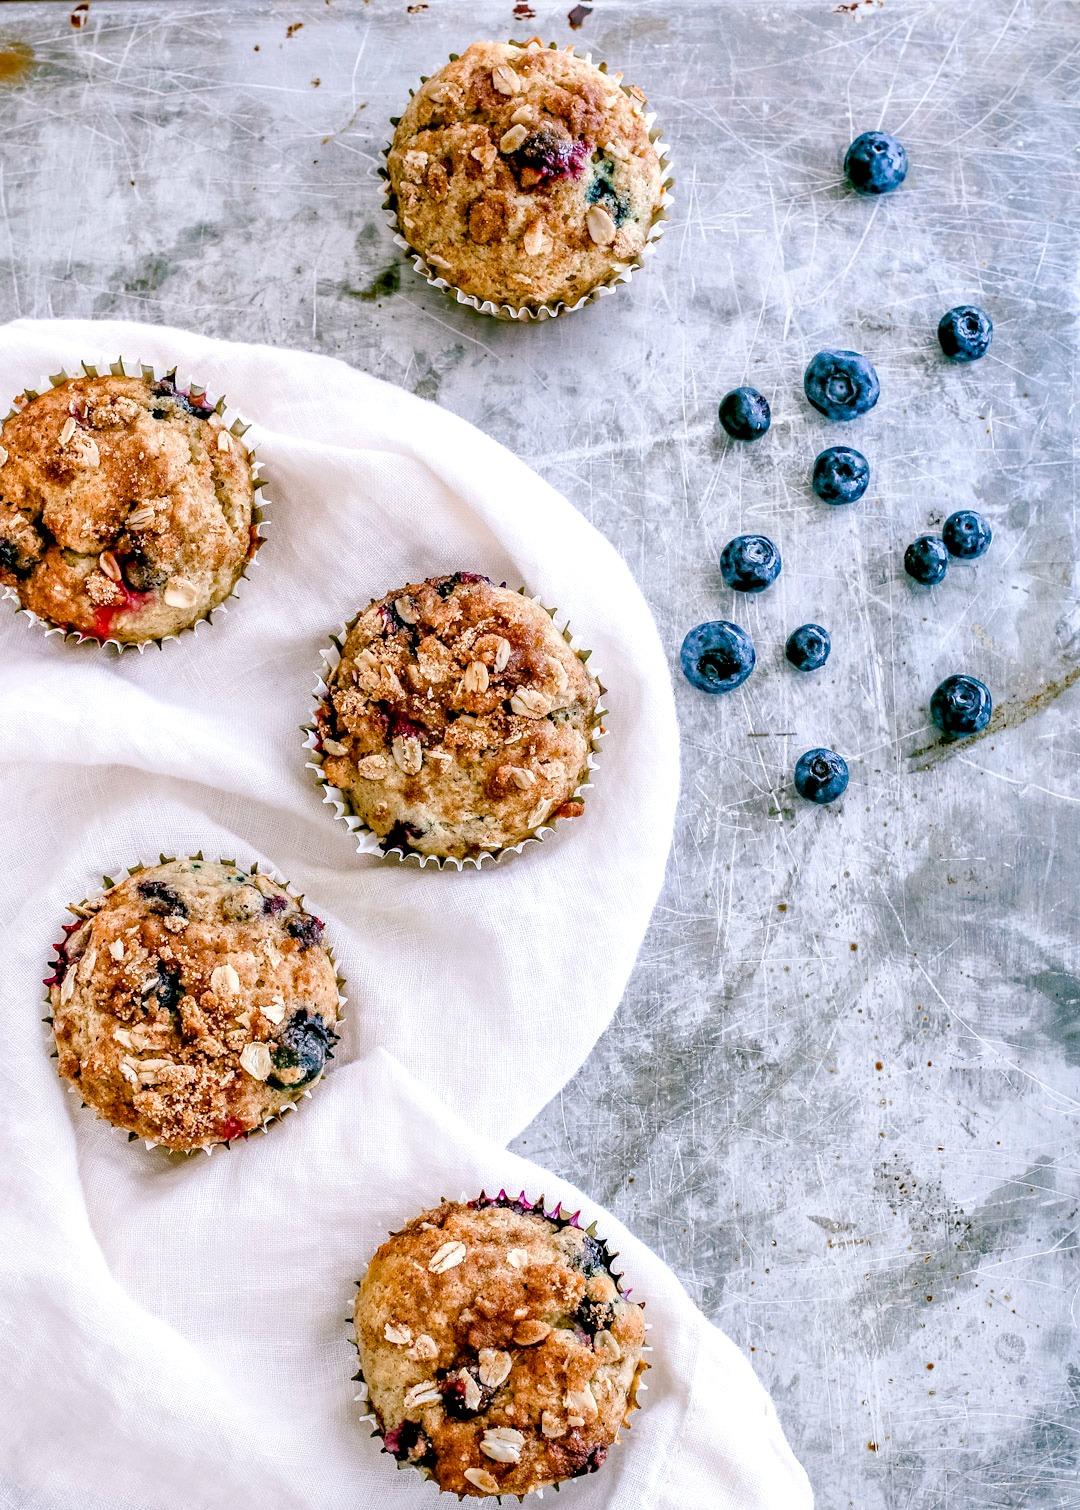 Blueberry Banana Oat Crumb Muffins | Killing Thyme